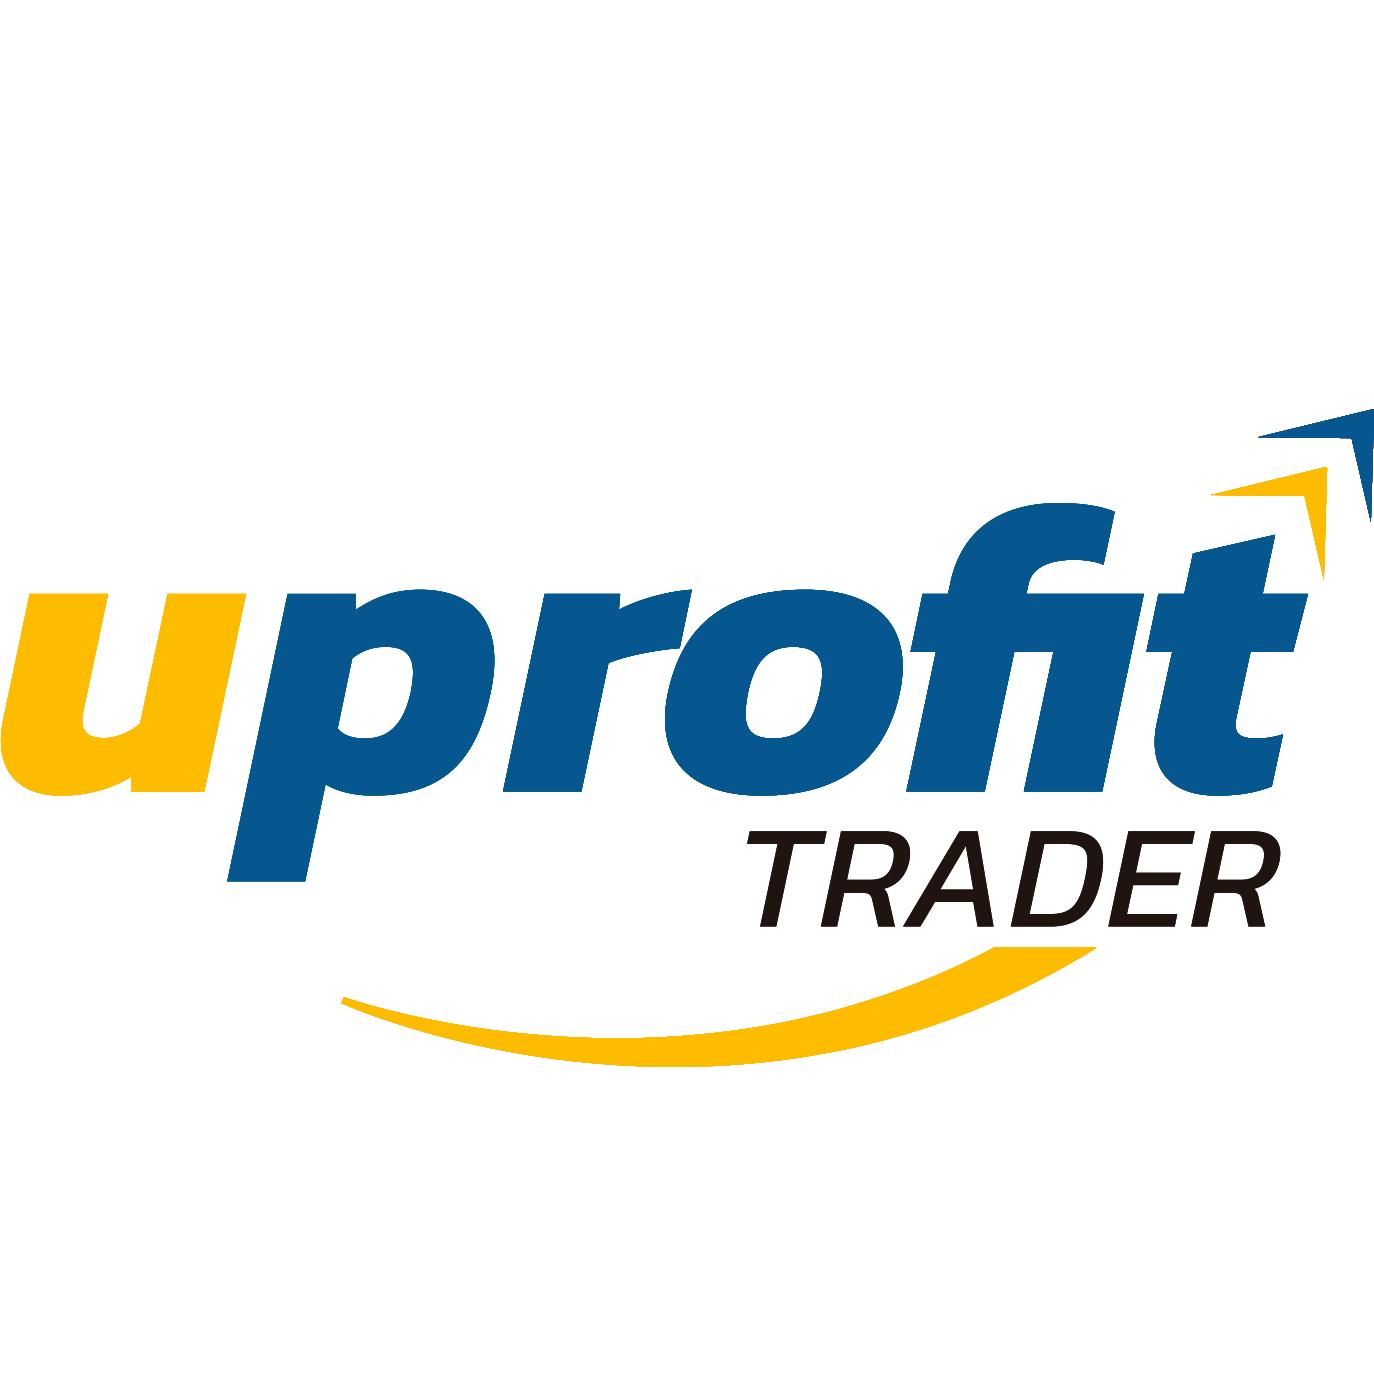 Momentum Trading Telegram Descuentos de UProfitTrader Link Thumbnail   Linktree